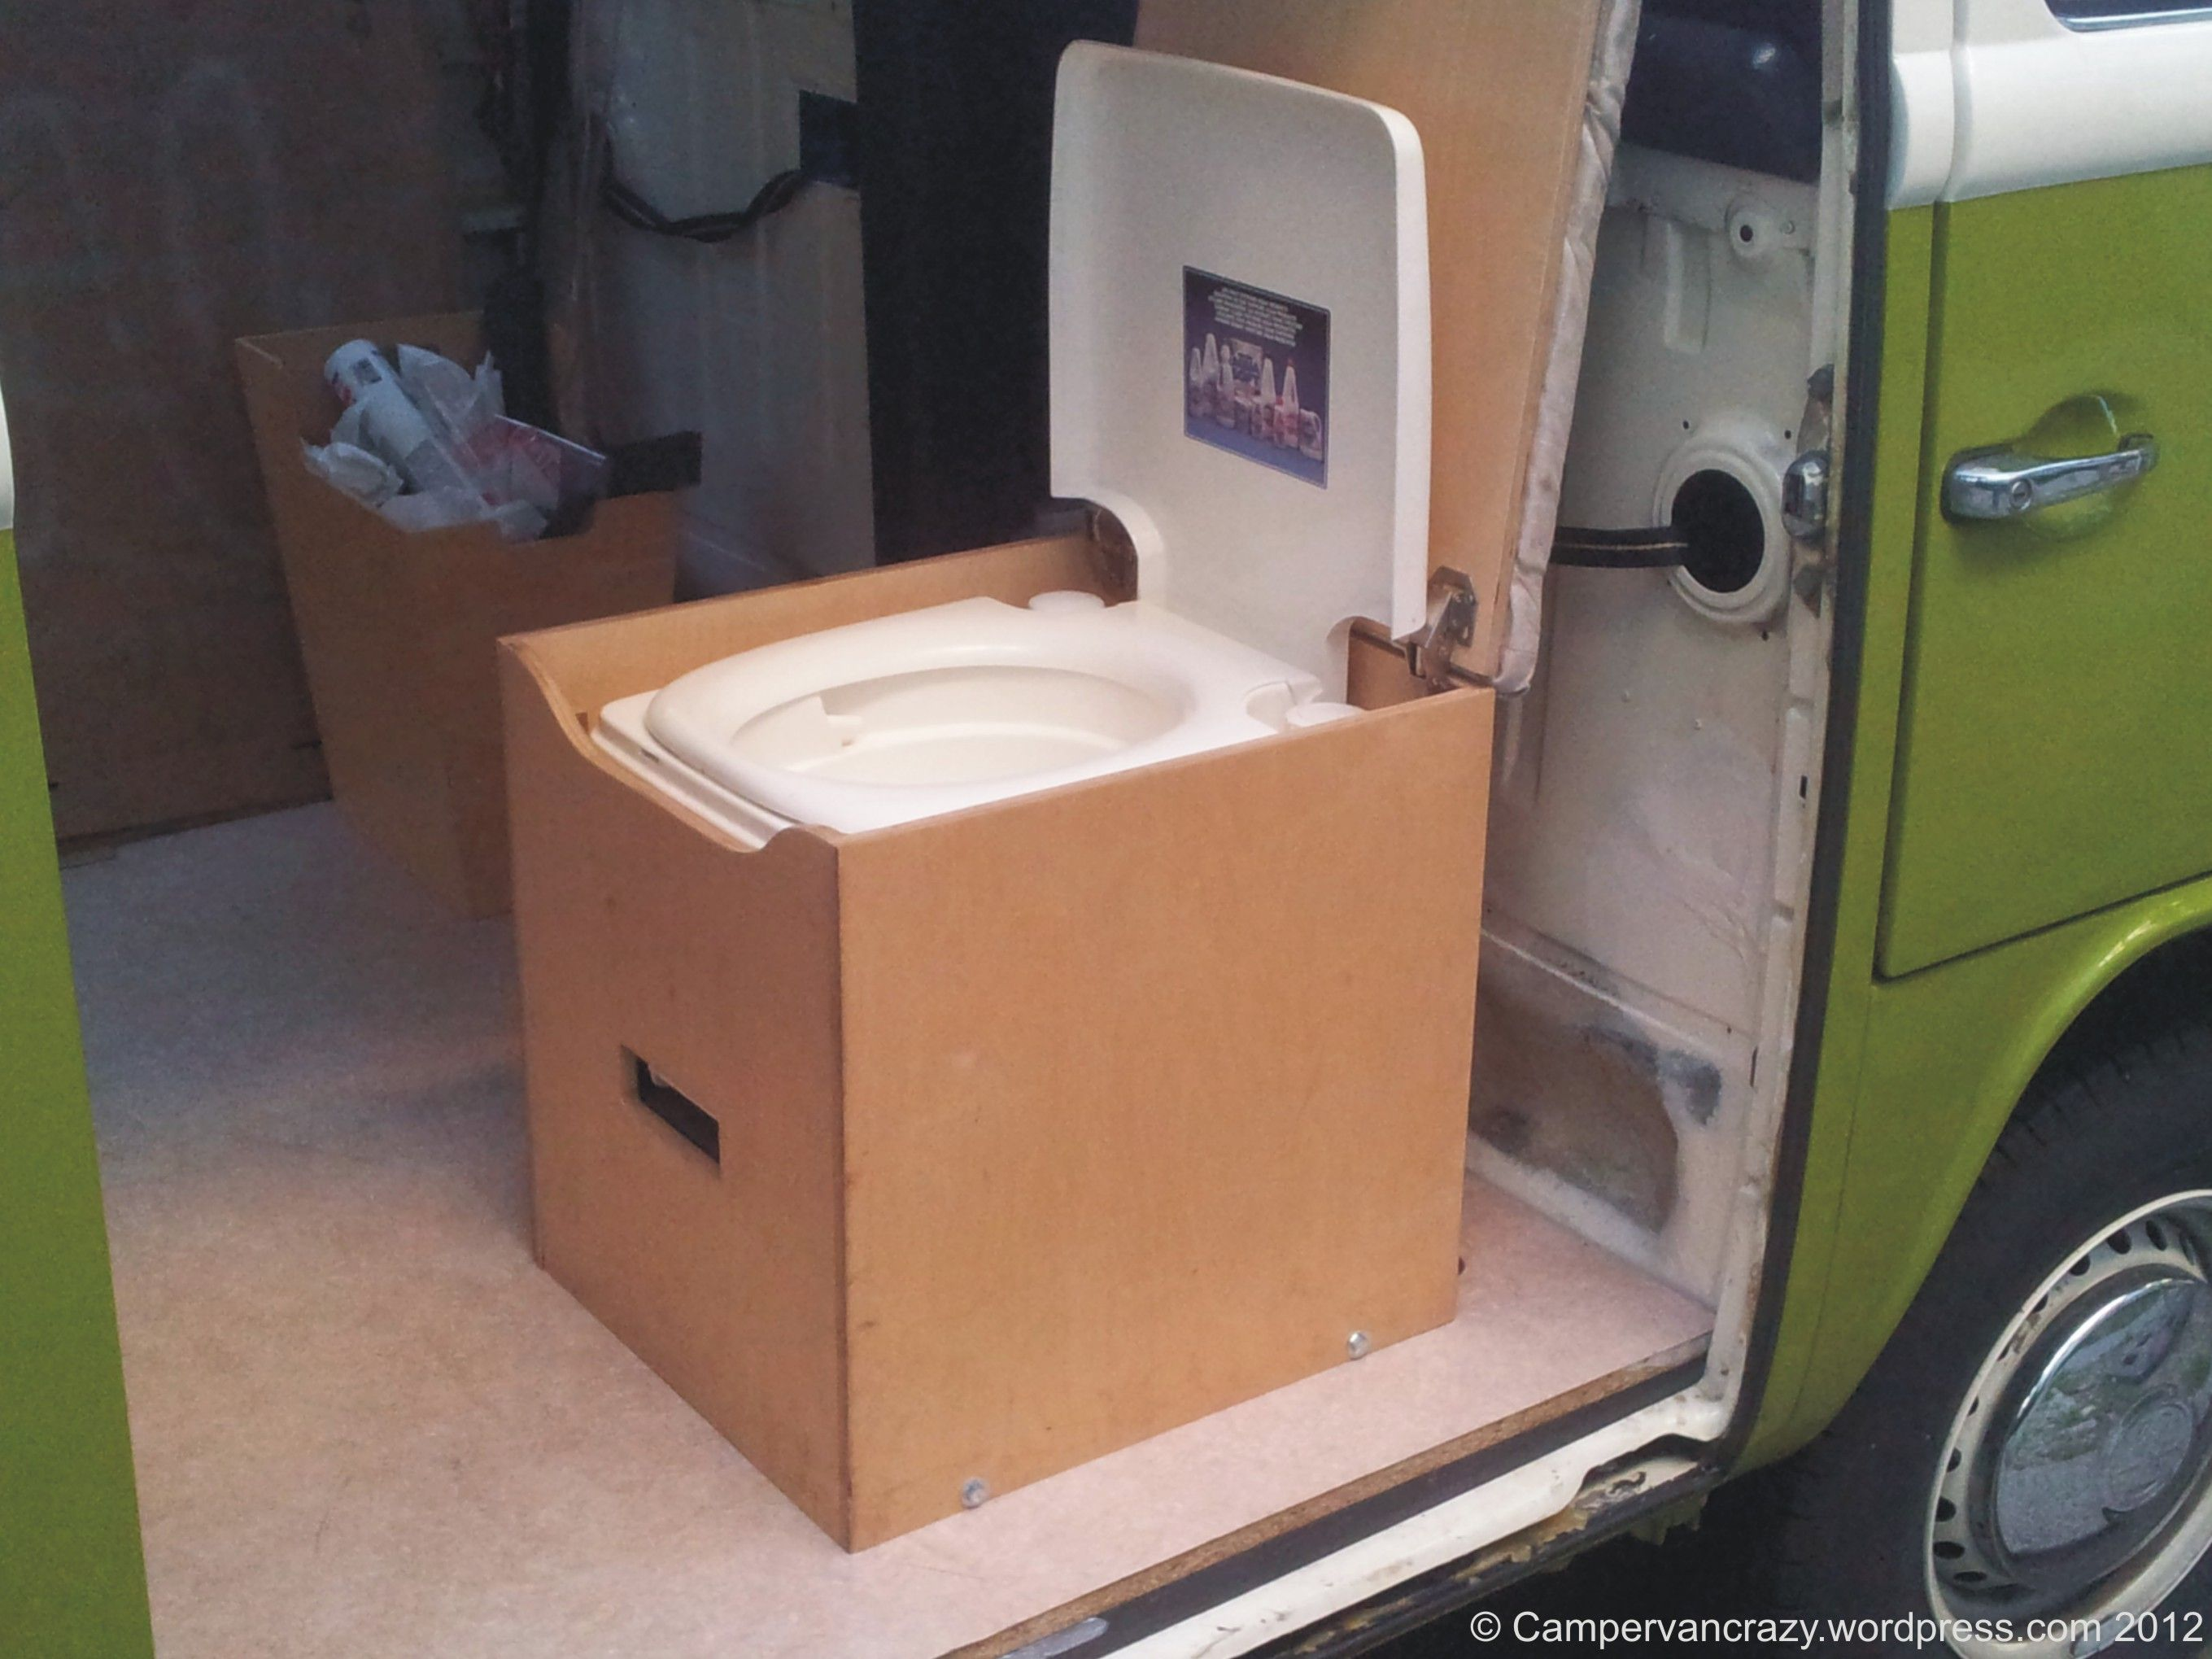 Related Image Camping Camping Toilet Camper Van Van